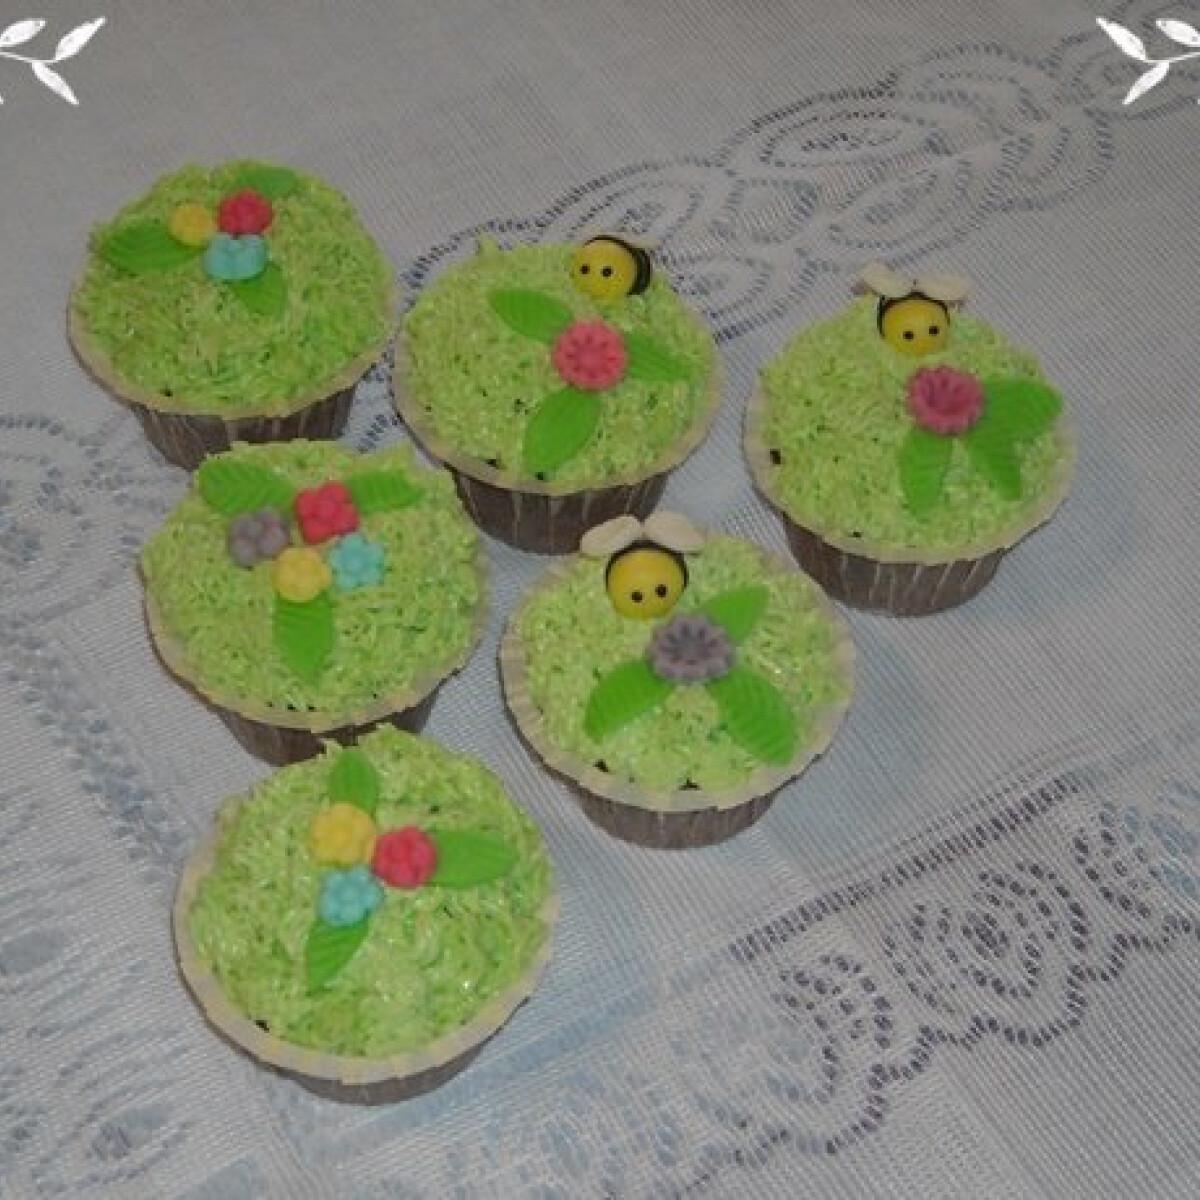 Ezen a képen: Tavaszi muffin